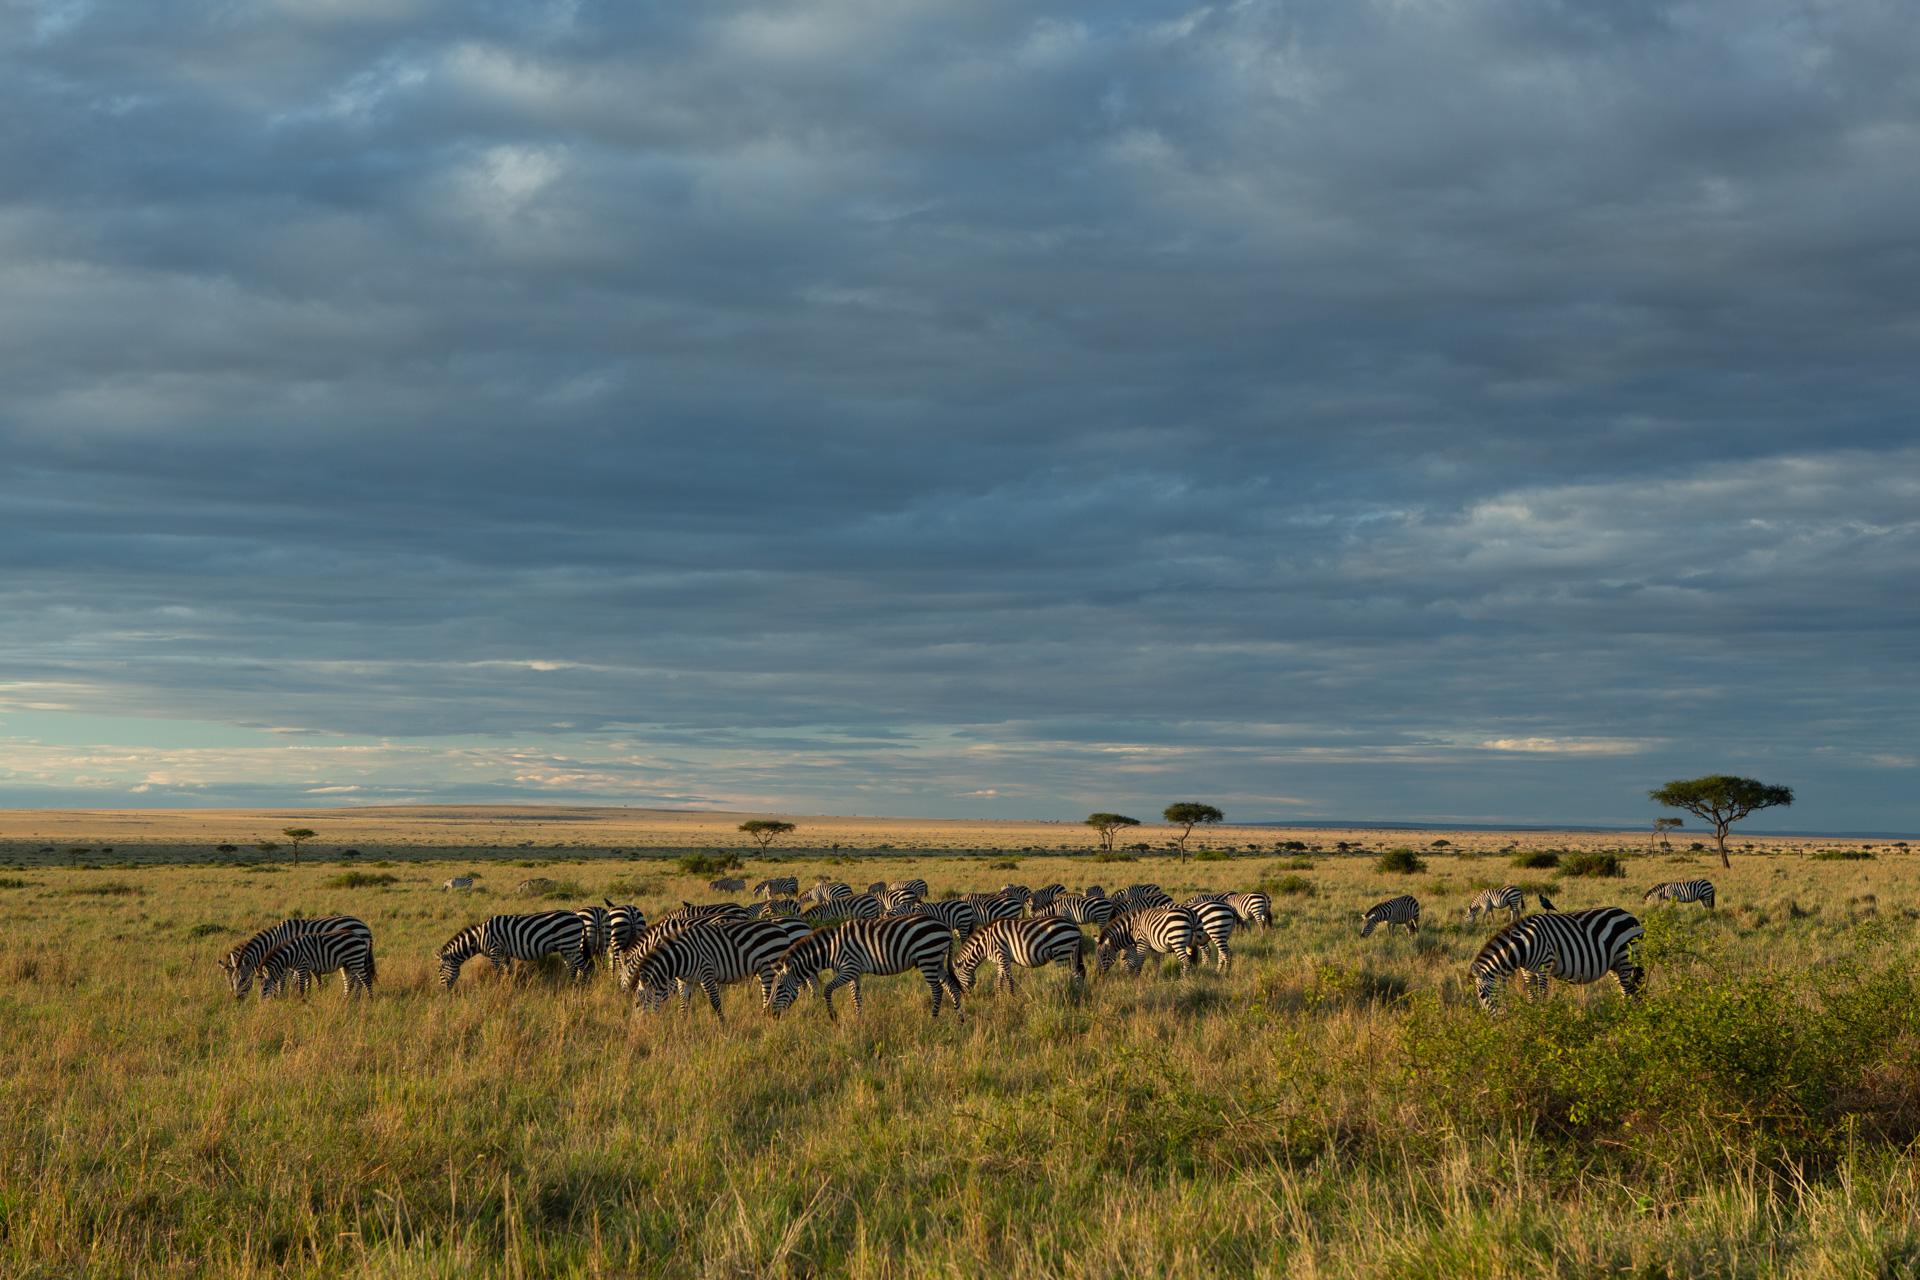 zebra and landscape